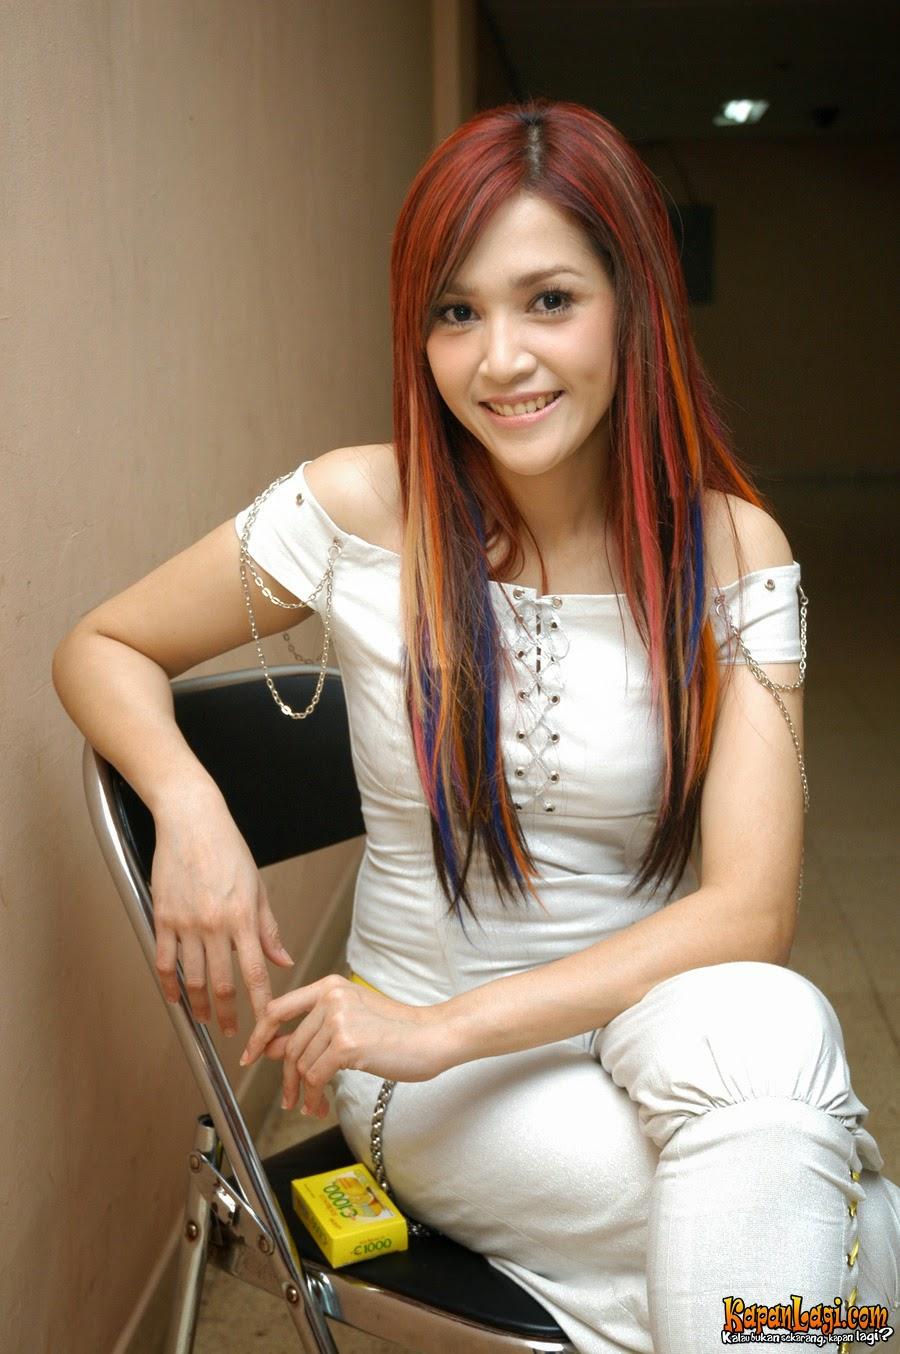 Maia Foto Wanita Cantik Asia Gambar Seksi Hot Franda